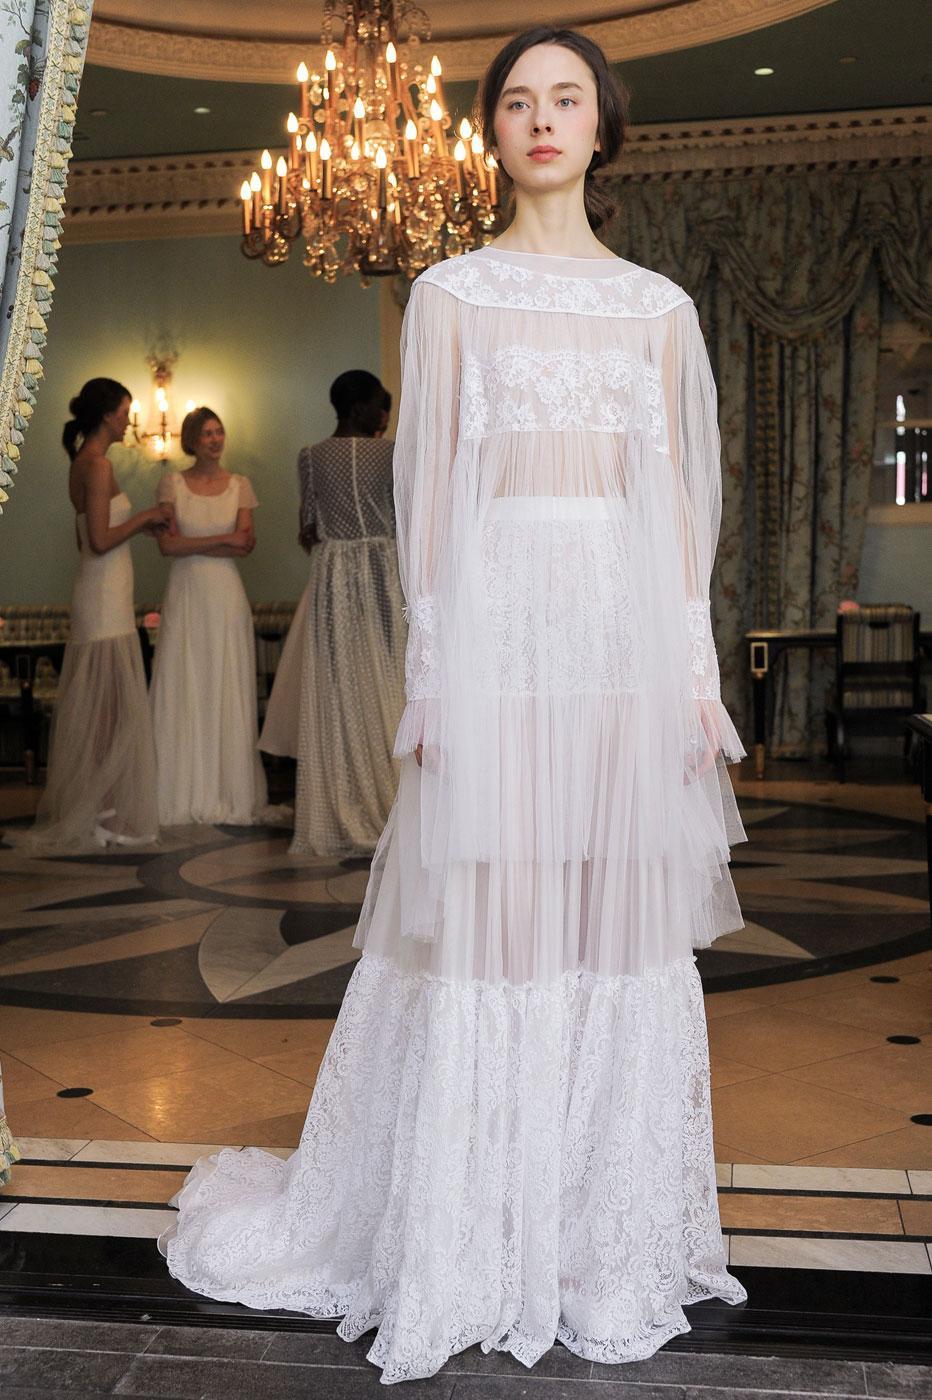 a6d4649e2ed ... de robes de mariée 2017 - Delphine Manivet Les collections de robes de  mariée 2017 - Delphine Manivet Les collections de robes de mariée 2017 -  Delphine ...